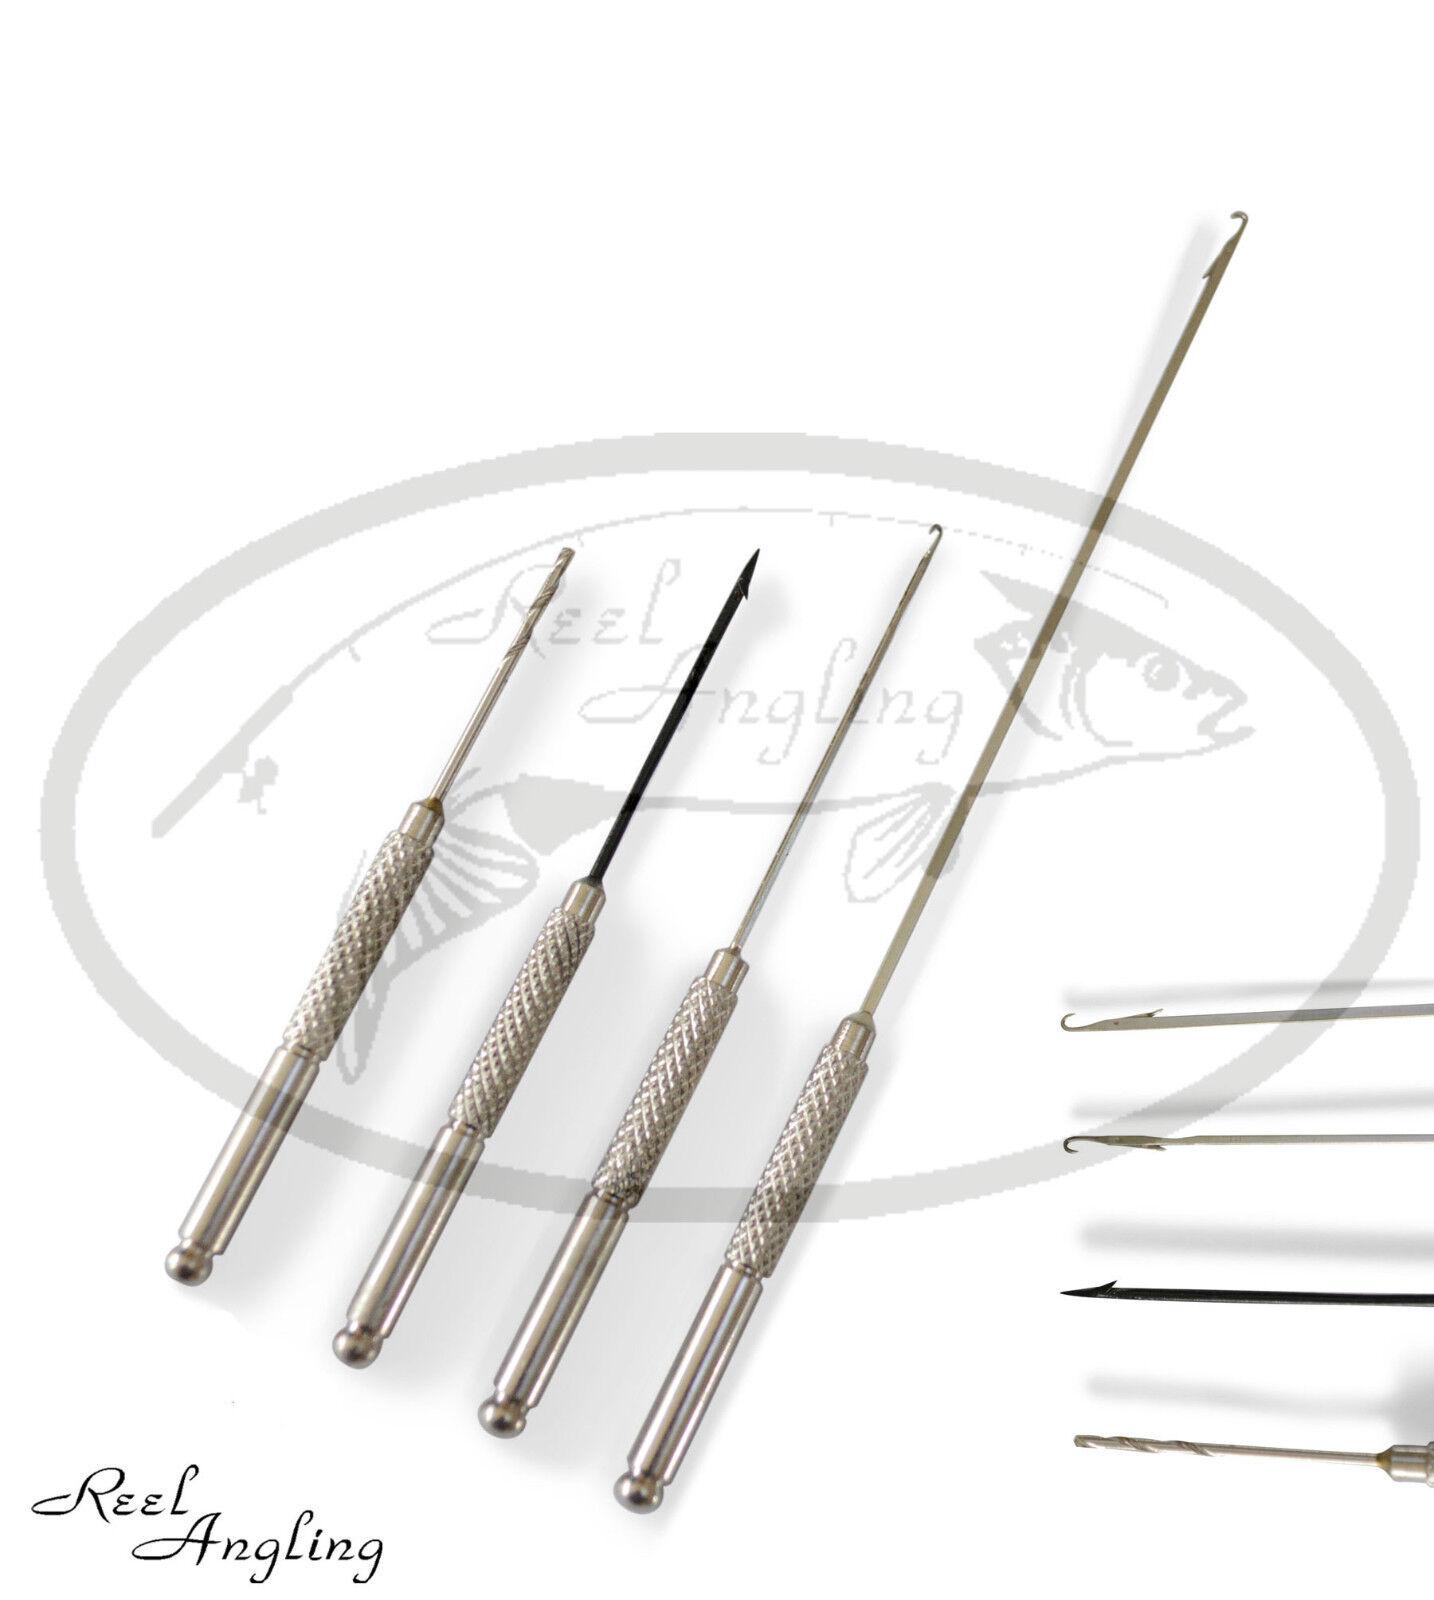 NGT Baiting Needle Set 4 Piece Hook Drill Boilie Stringer Bait NGT Carp Fishing